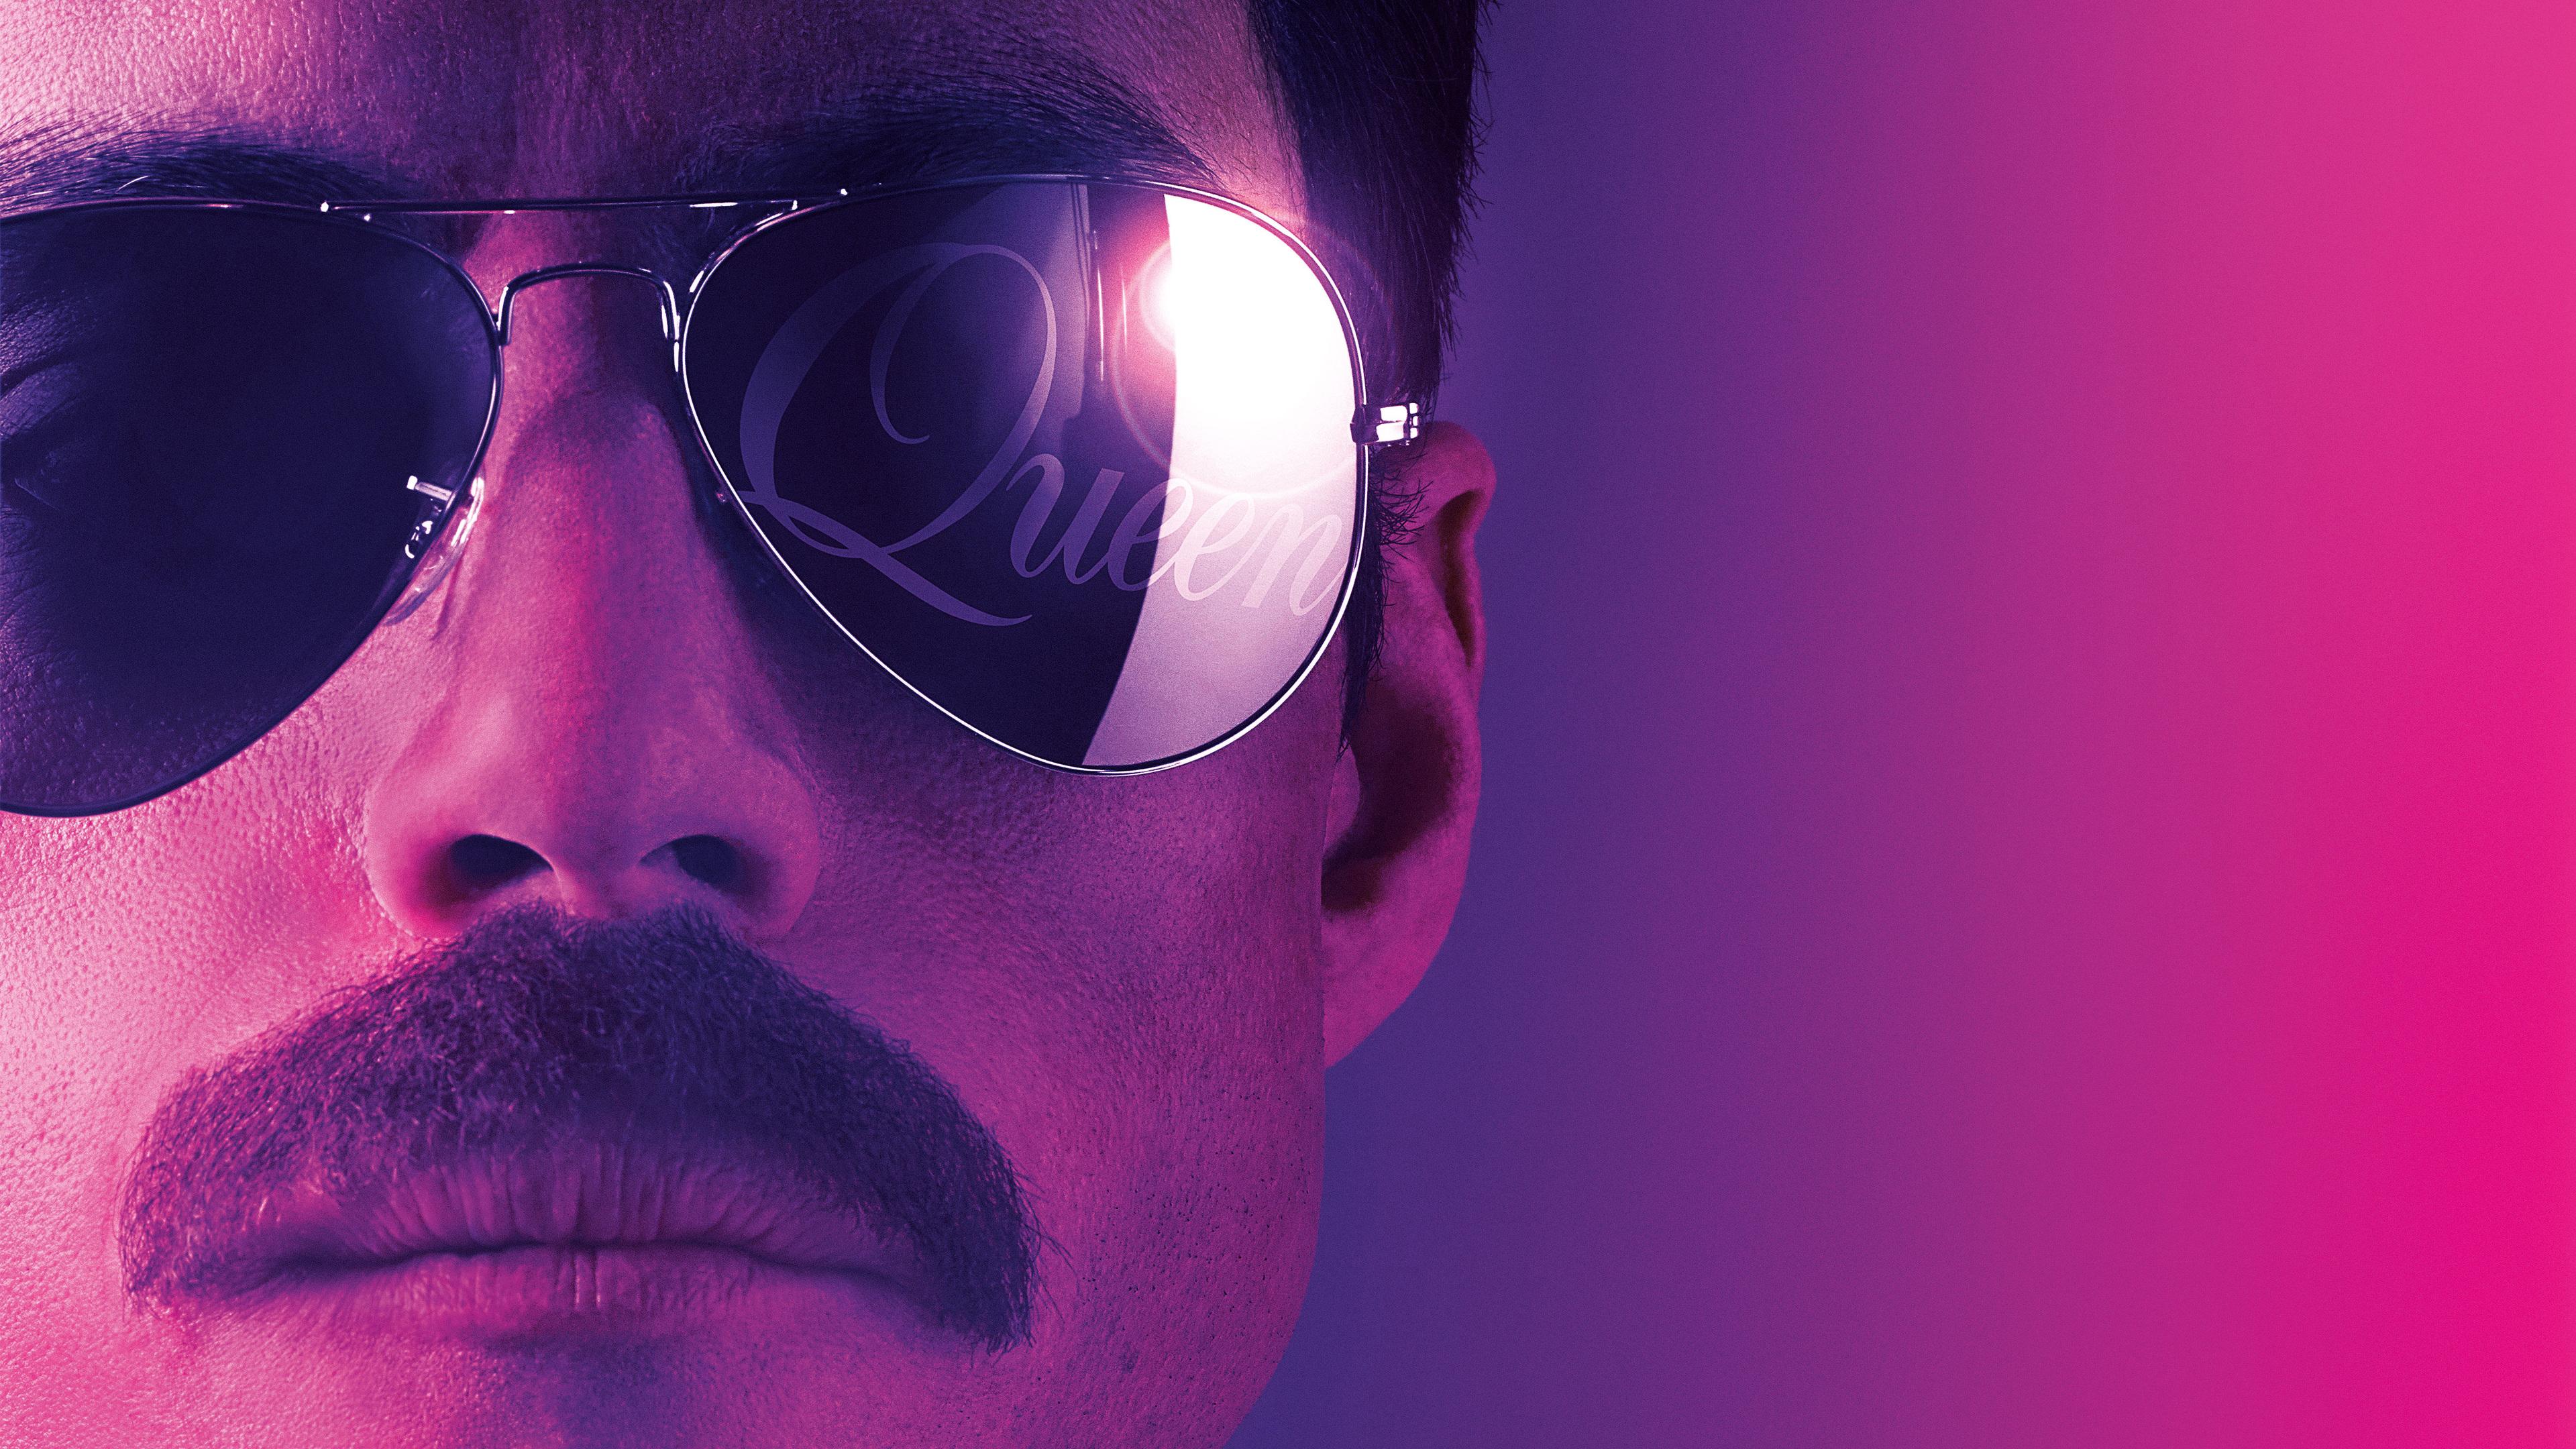 bohemian rhapsody 5k 1539979638 - Bohemian Rhapsody 5k - rami malek wallpapers, movies wallpapers, hd-wallpapers, bohemian rhapsody wallpapers, 5k wallpapers, 4k-wallpapers, 2018-movies-wallpapers